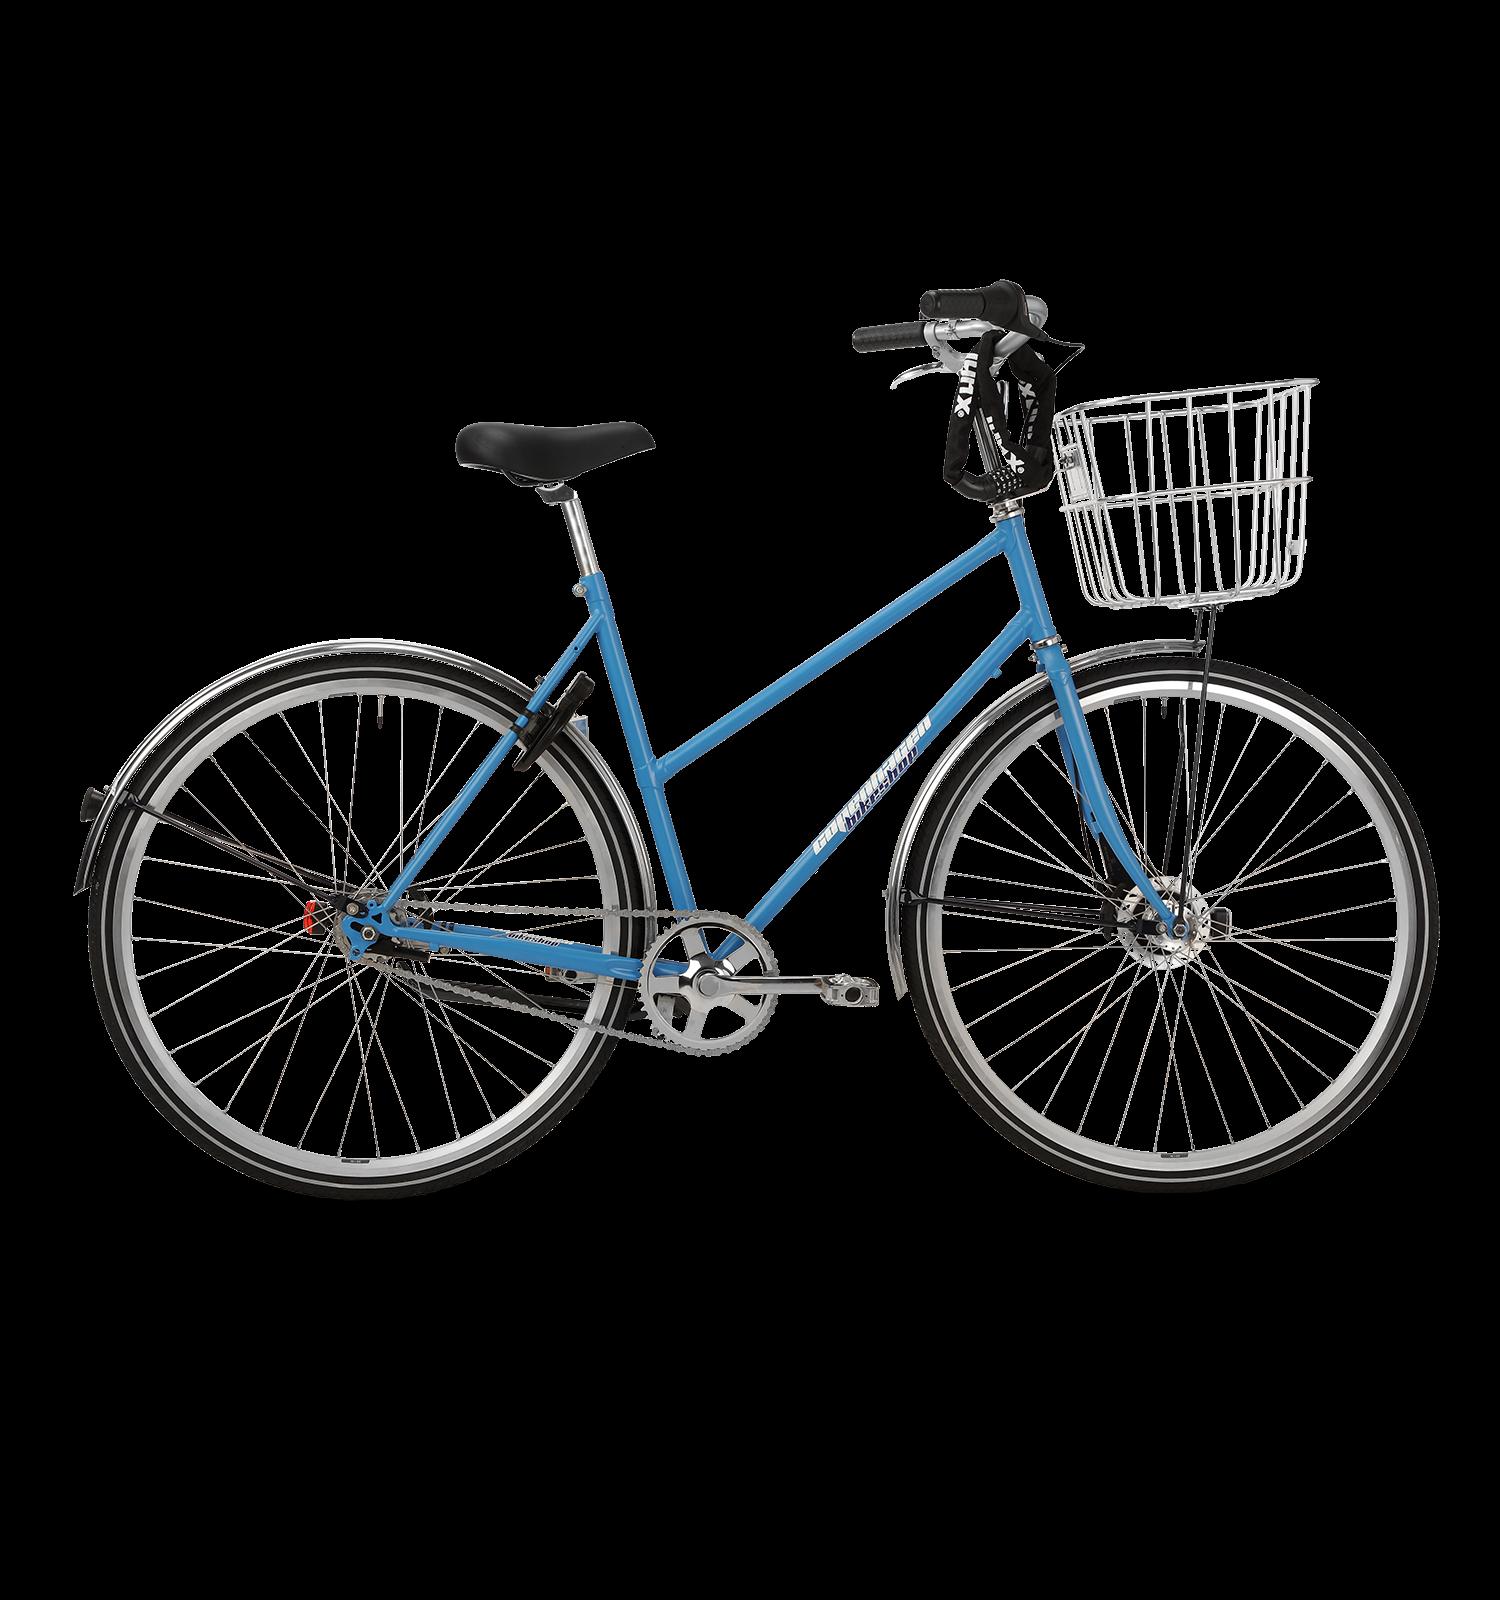 Cykelabonnement%20en%20cykel%20der%20altid%20virker